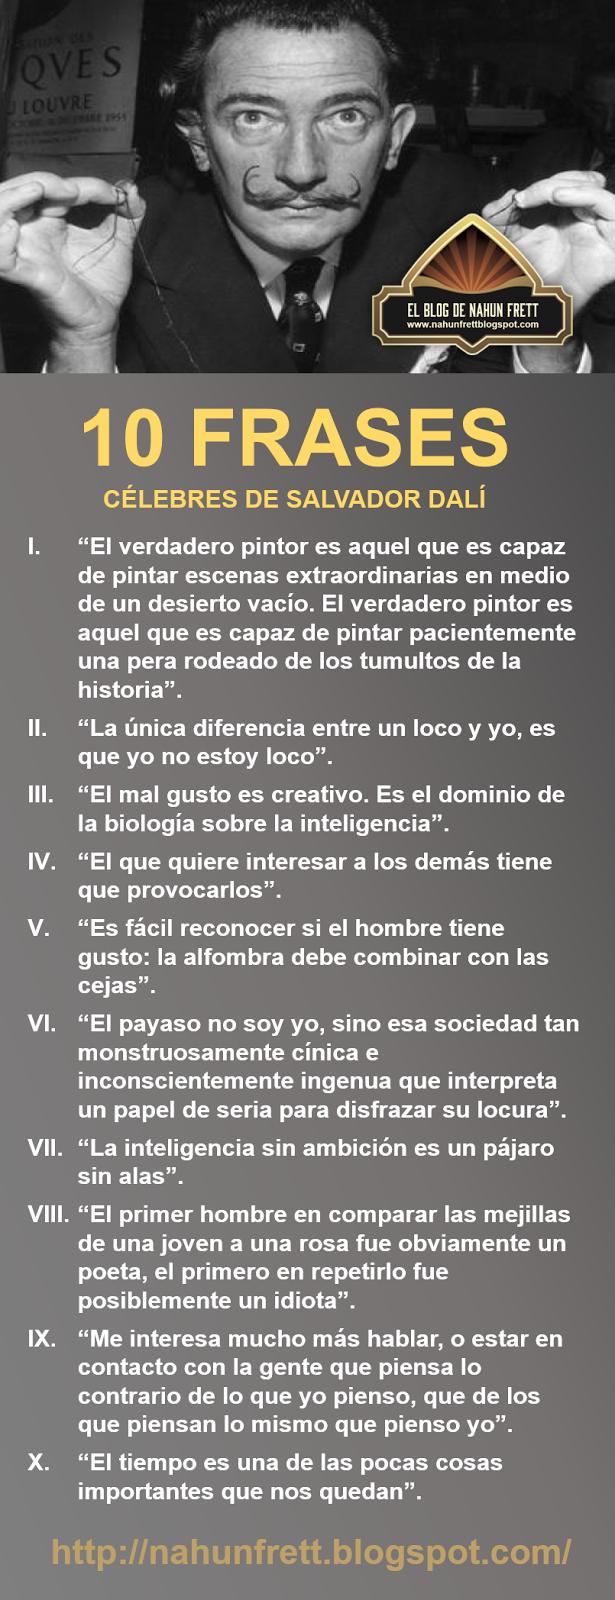 Nahun Frett 10 Frases Célebres De Salvador Dalí